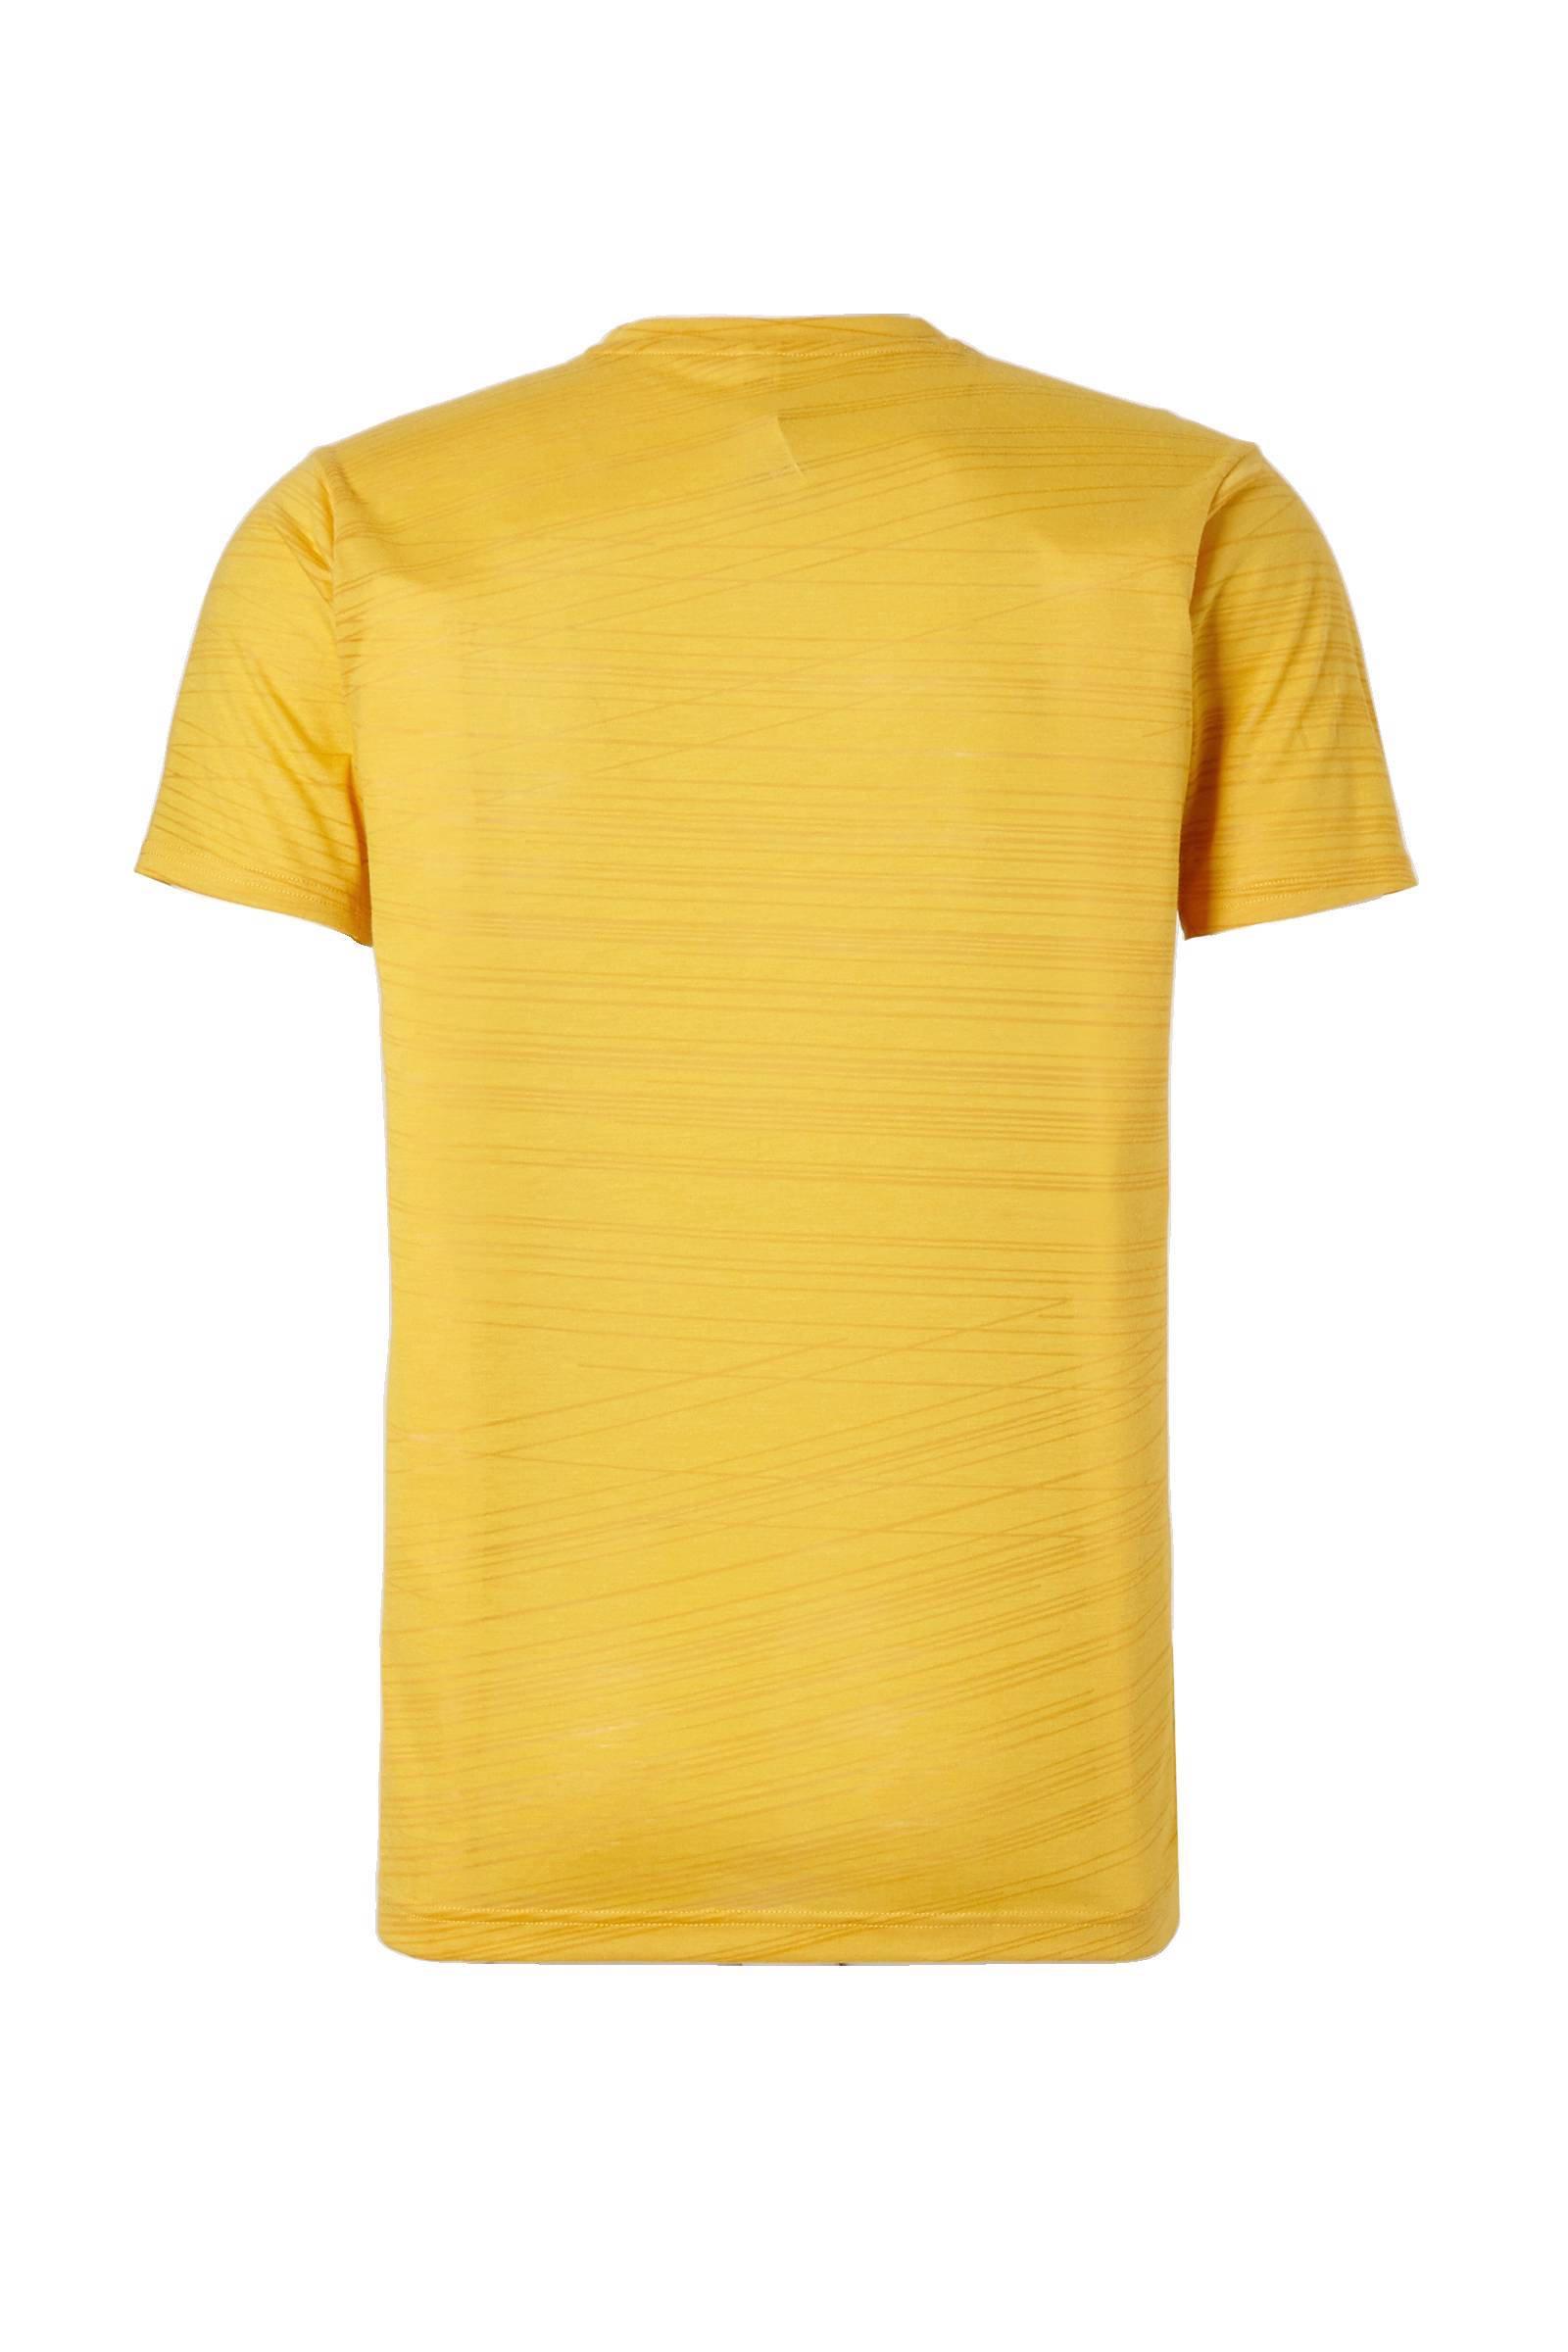 adidas Performance sport T-shirt geel